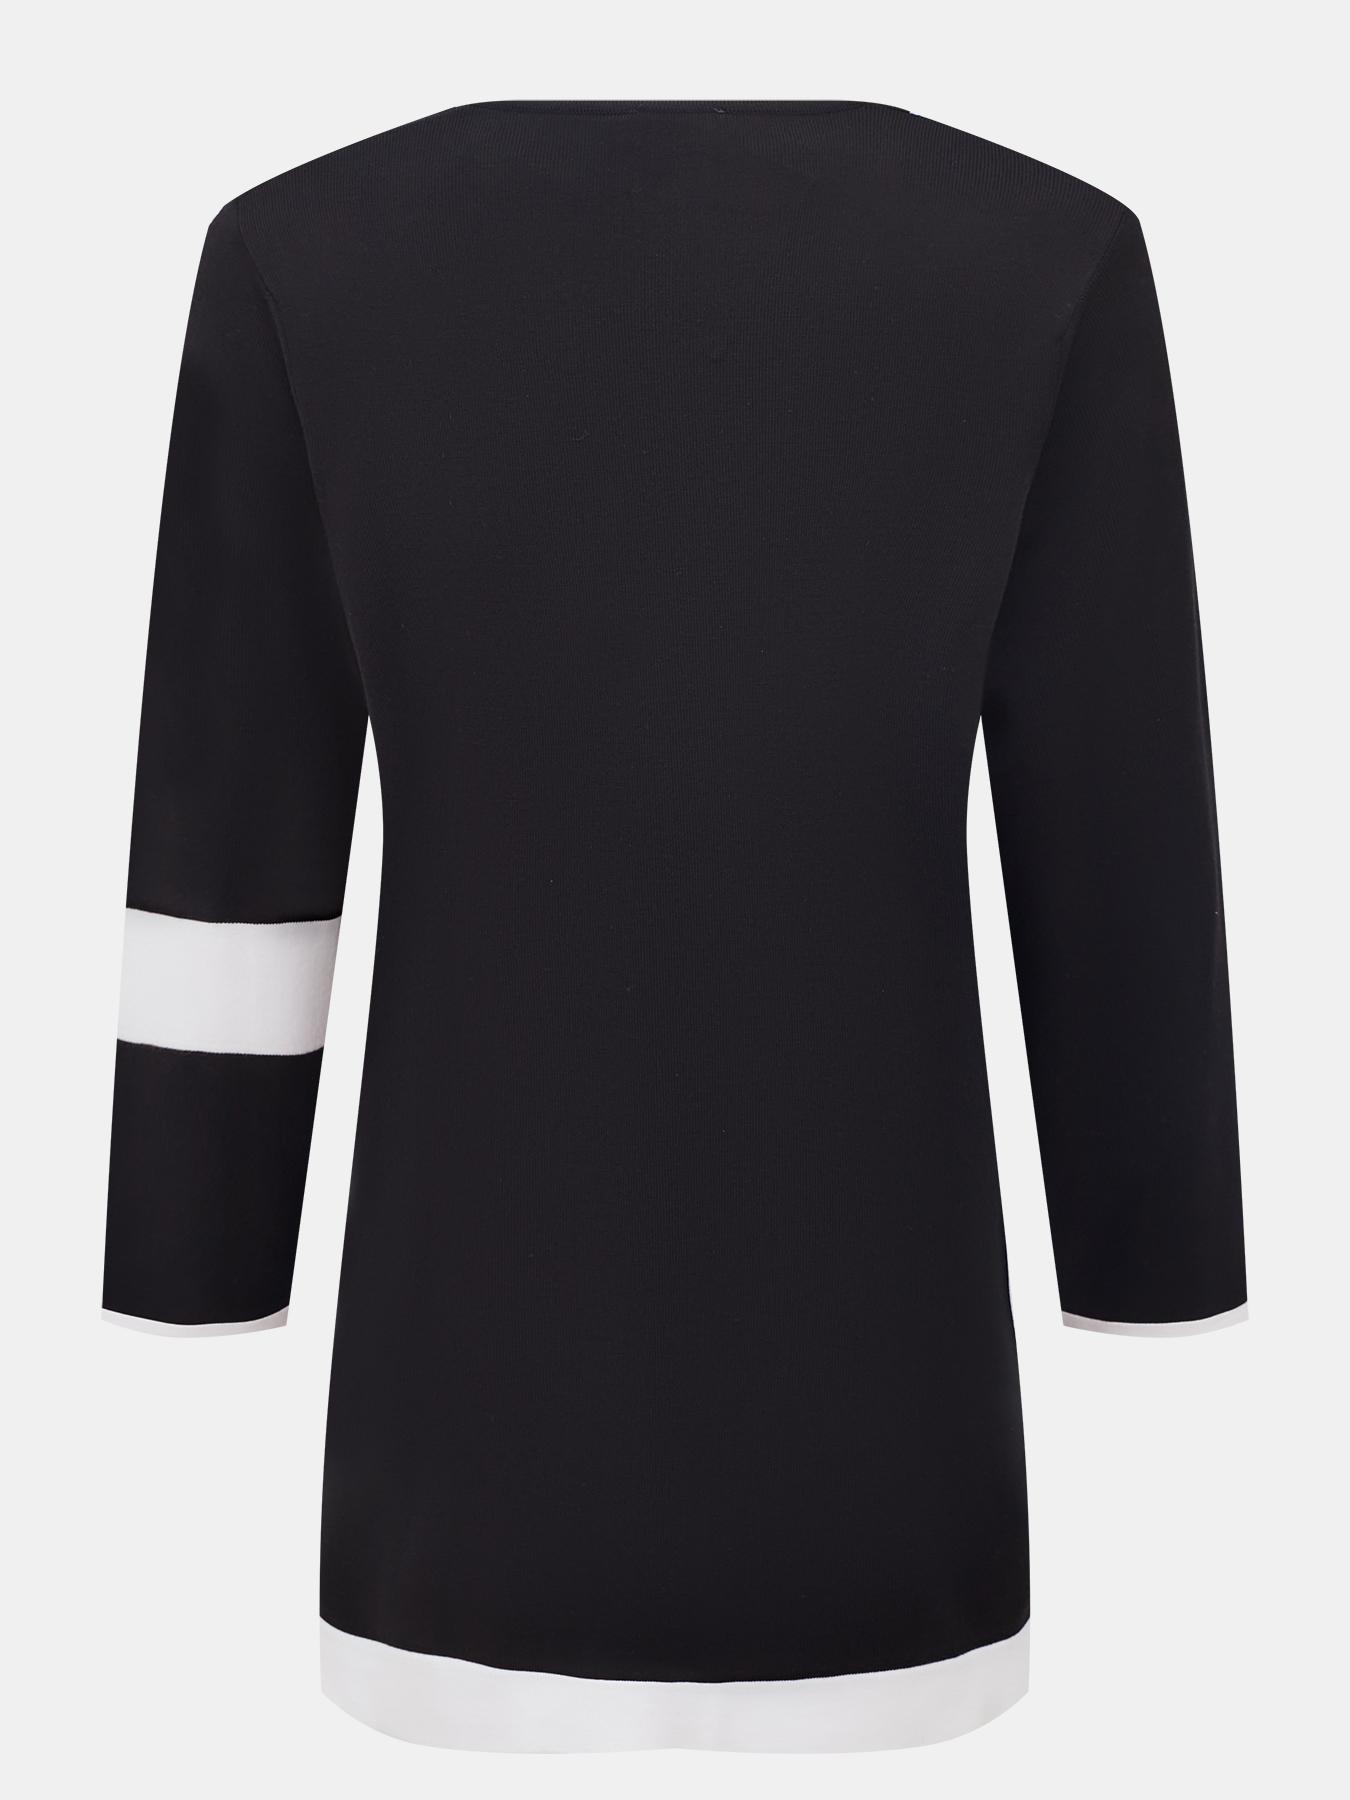 Джемпер Persona by Marina Rinaldi Свитер plus size marina sport by marina rinaldi свитер